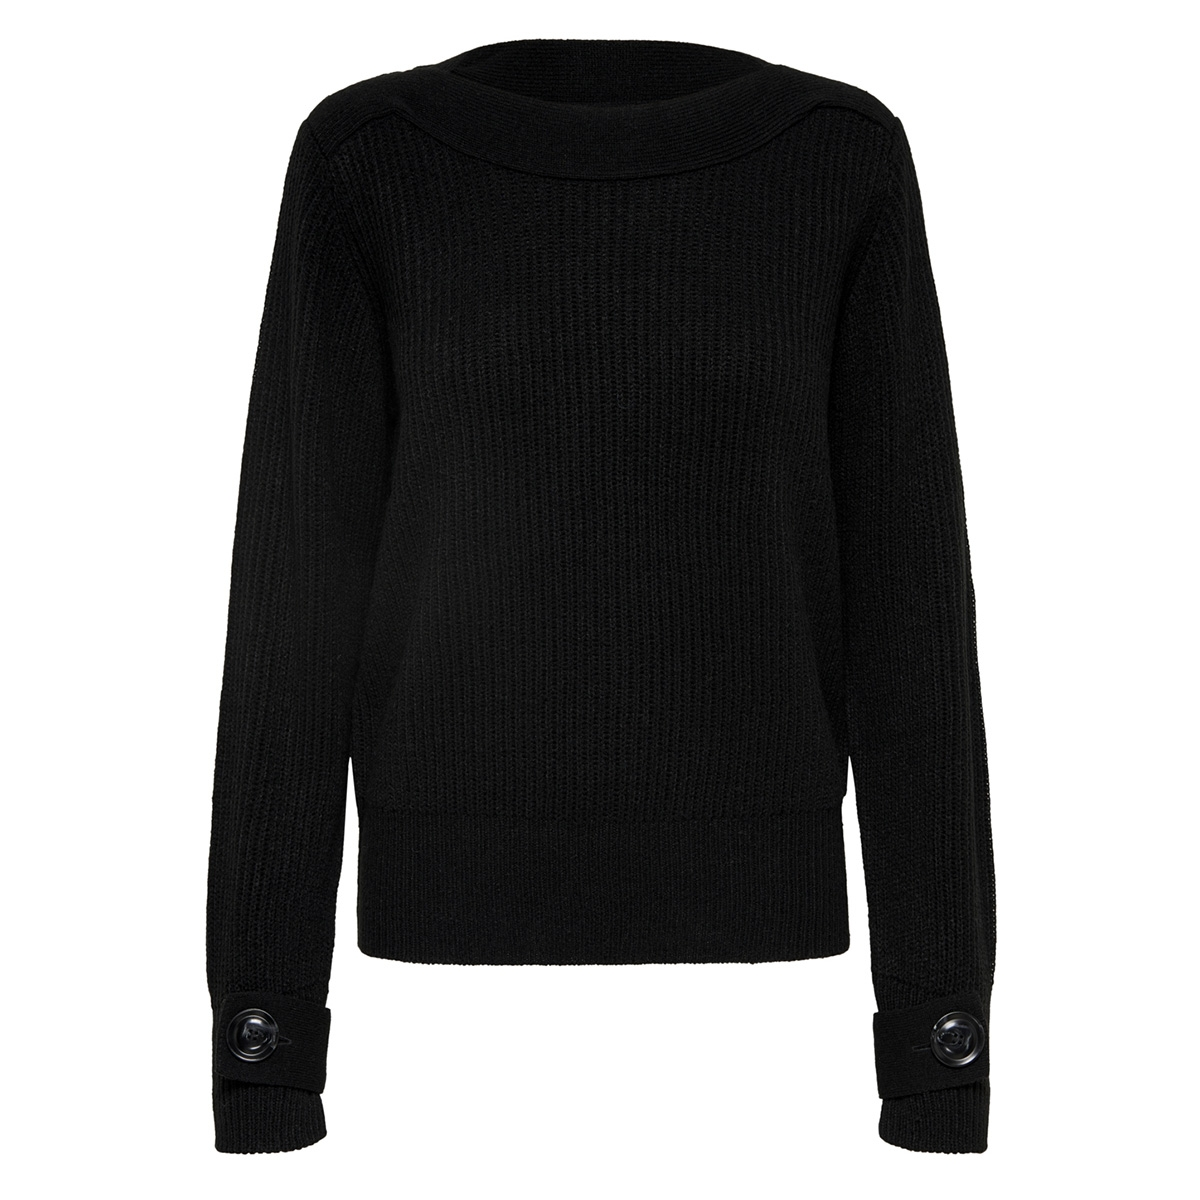 jdytonic l/s boatneck pullover knt 15163489 jacqueline de yong trui black/w. black f